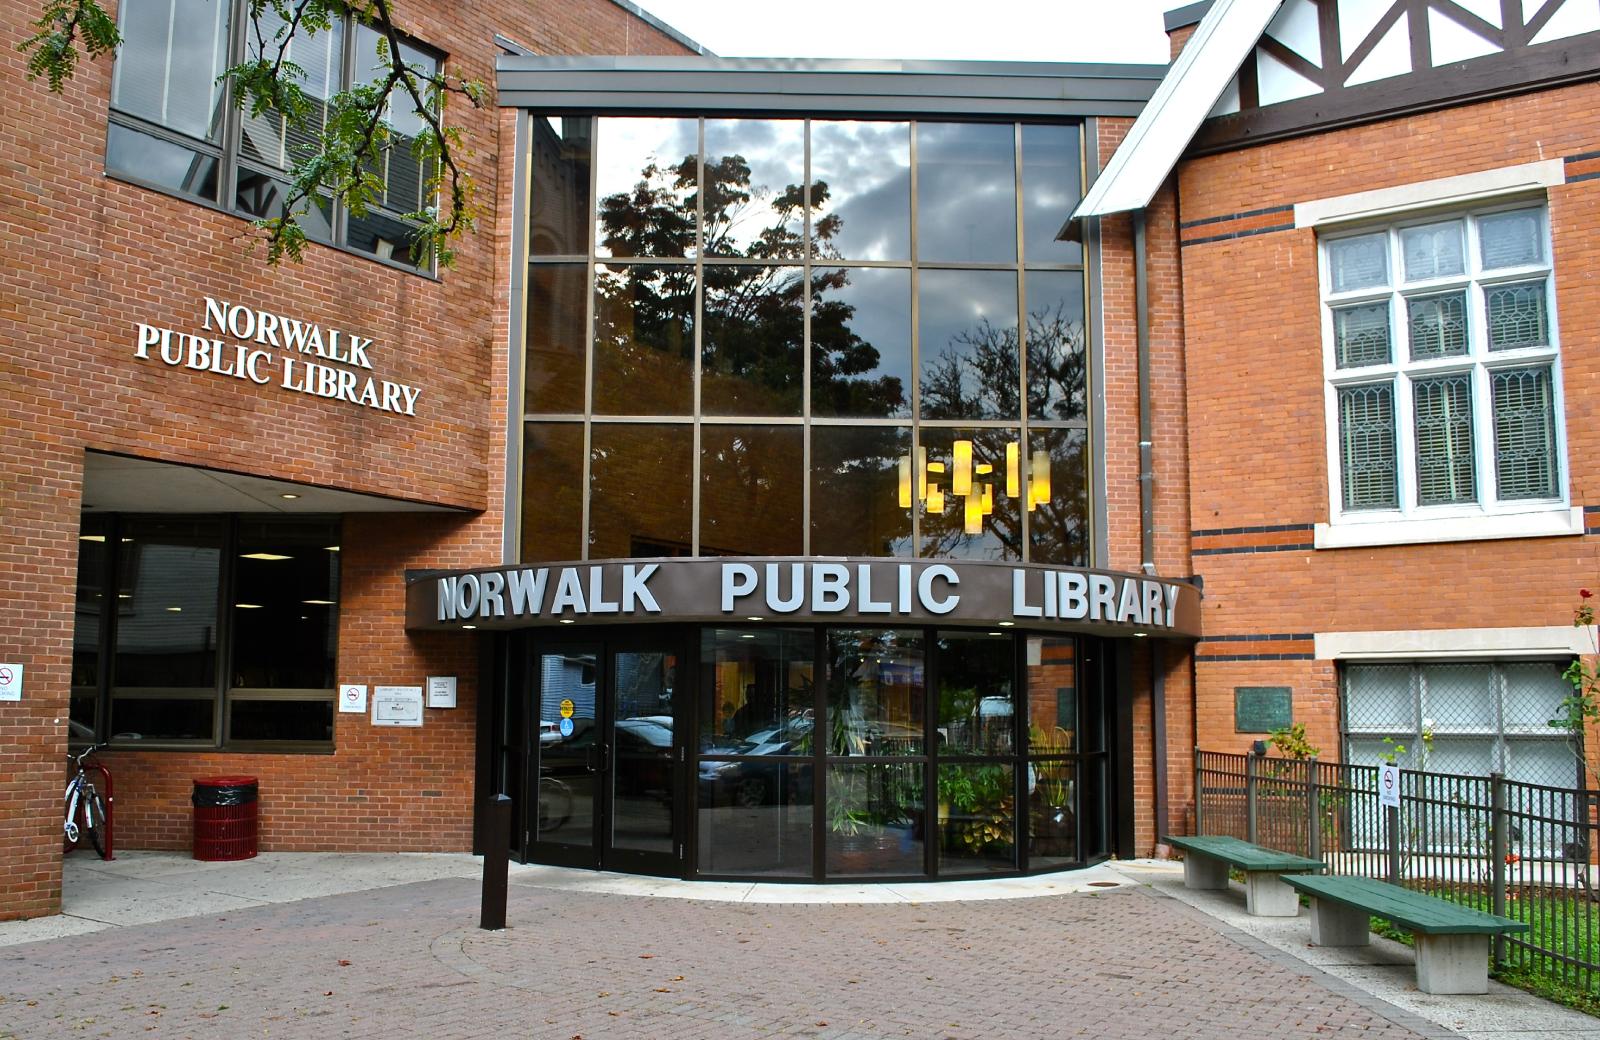 Norwalk Public Library - The Waypointe Apts